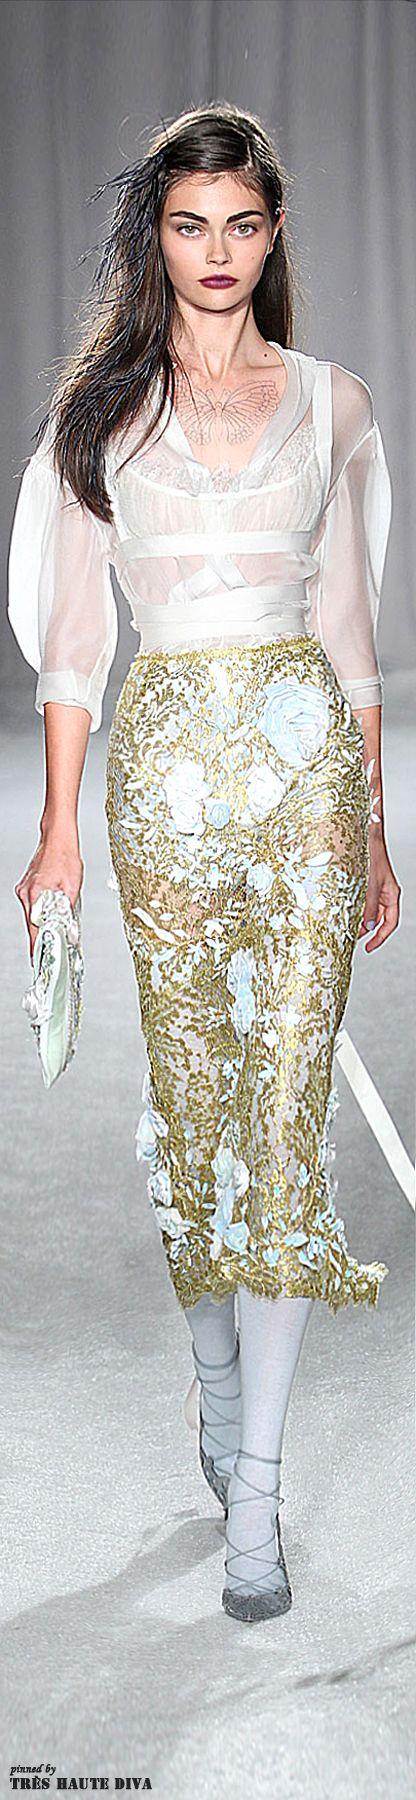 Marchesa Spring/Summer 2014 - New York Fashion Week -Runway